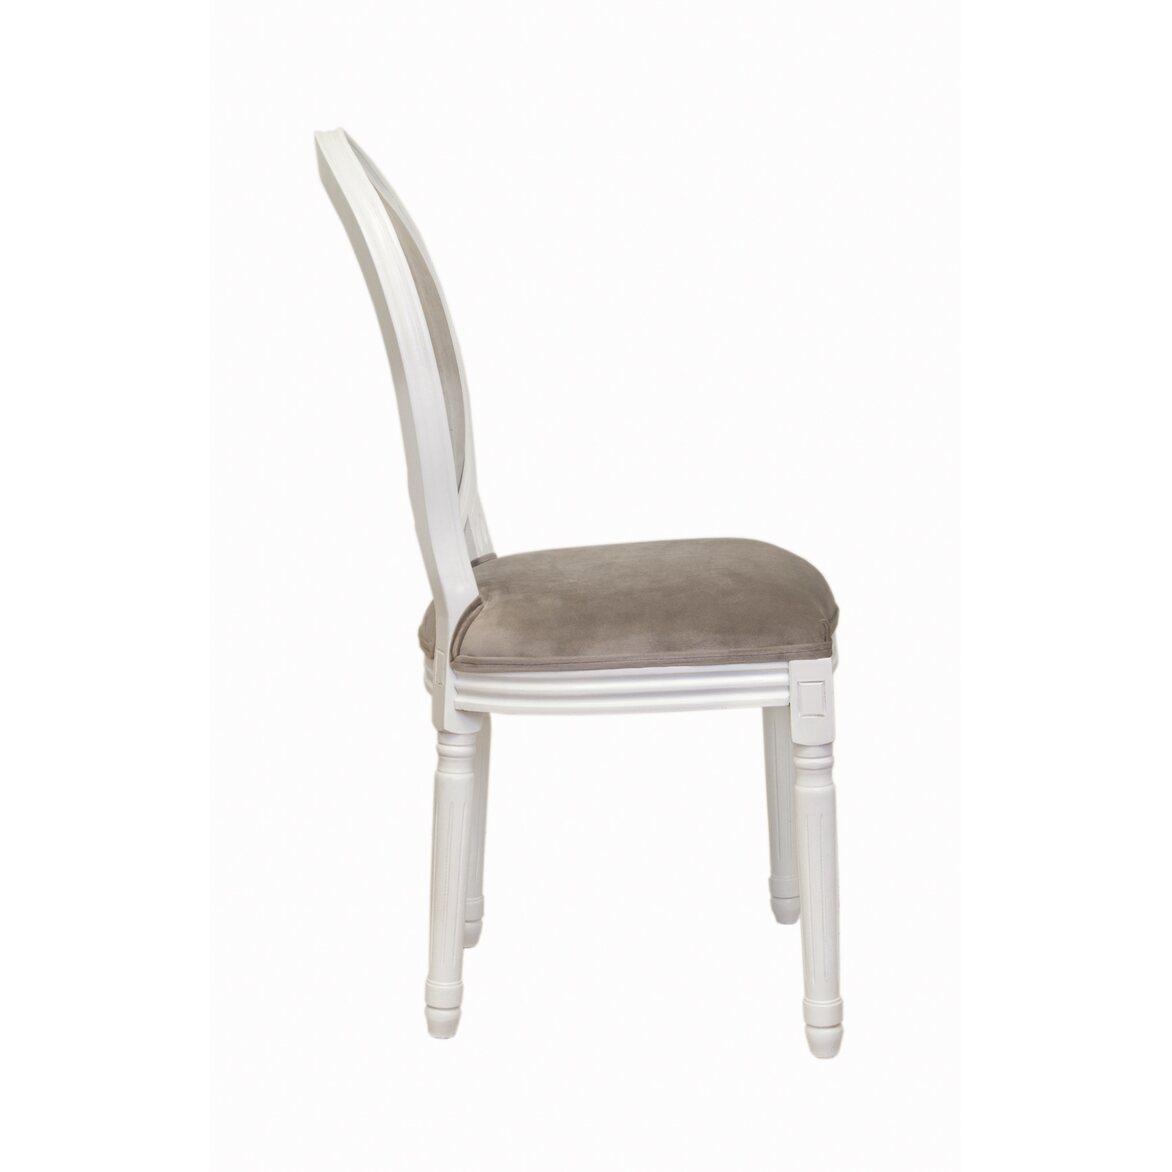 Стул Volker taupe 2 | Обеденные стулья Kingsby